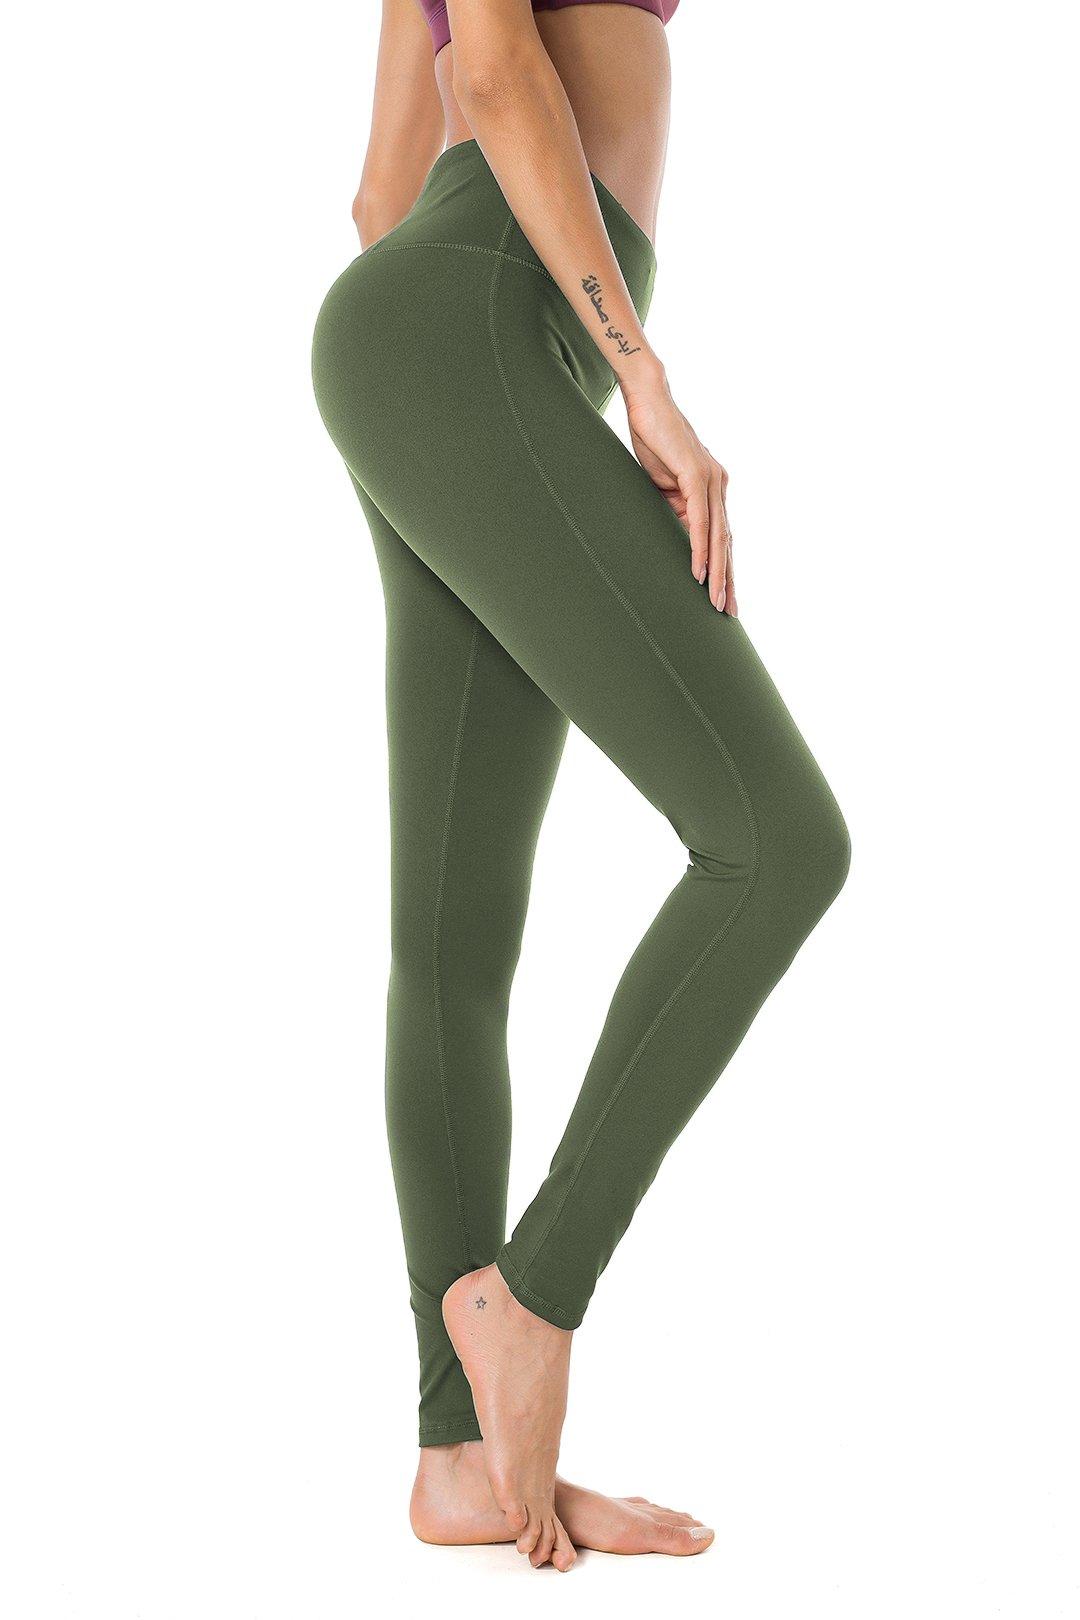 Queenie Ke Women Mid-Waist Hidden Pockets Sport Legging Yoga Pants Running Tights Size XS Color Army Green